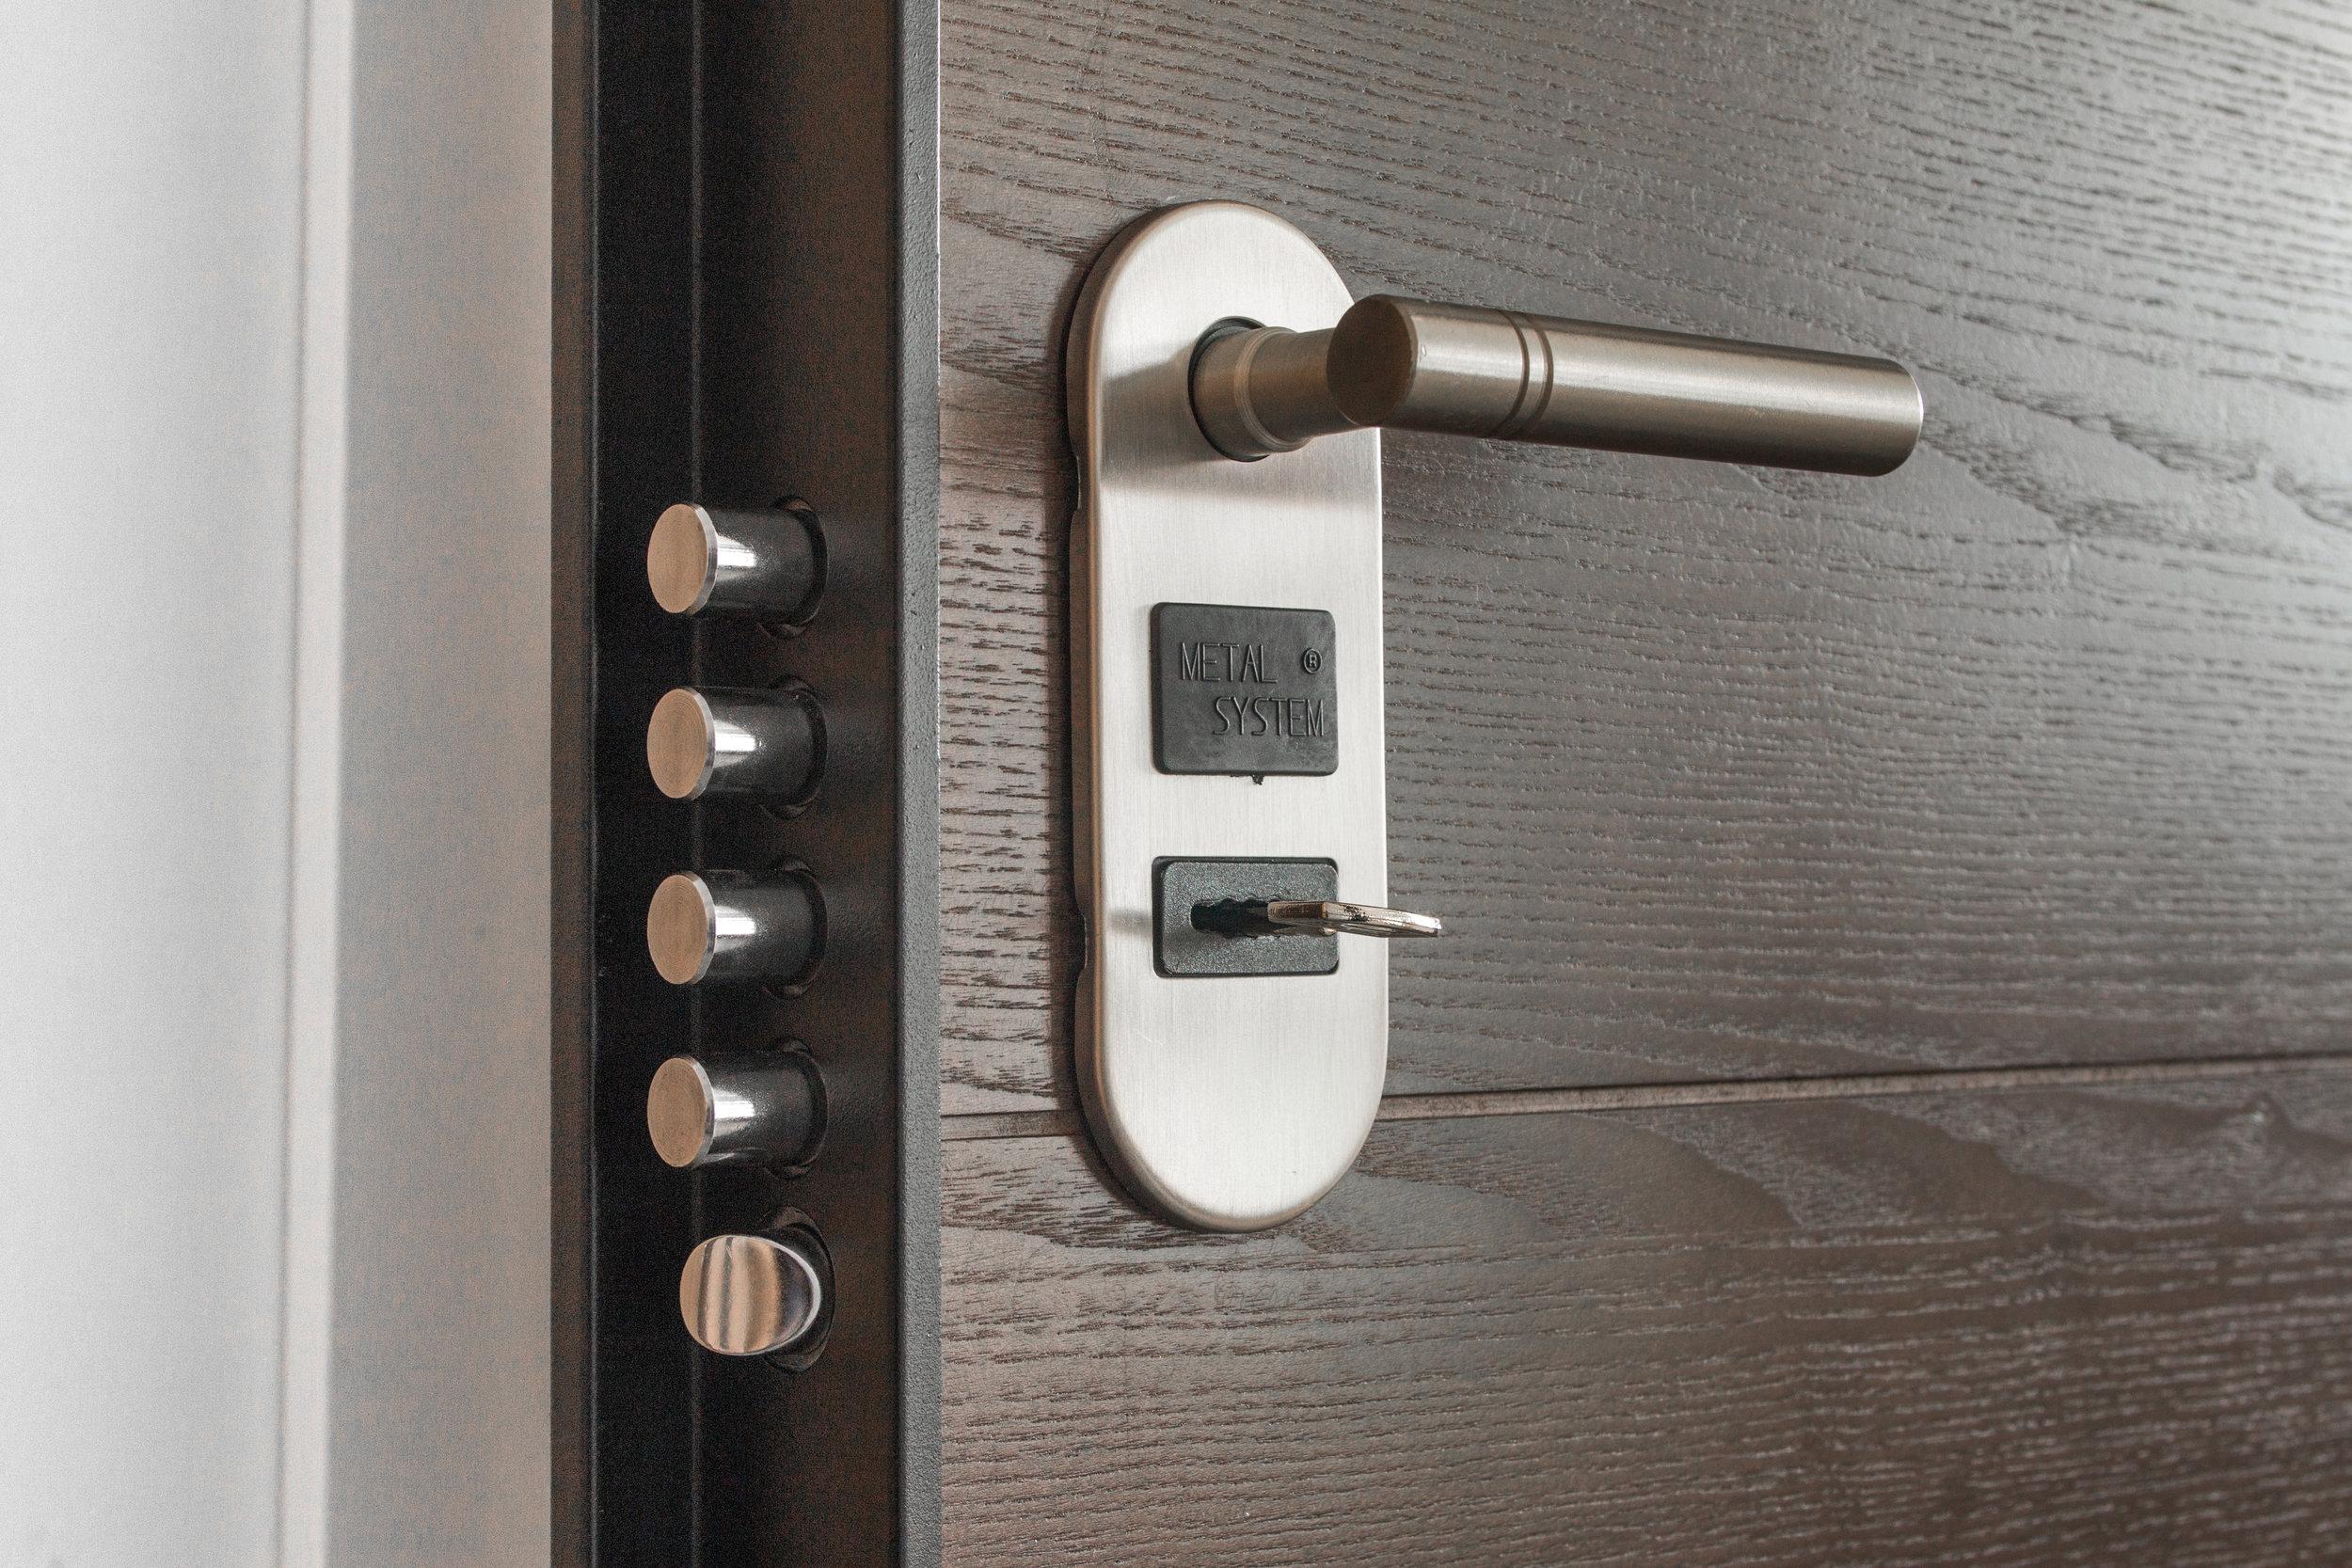 https://www.canva.com/photos/MADGxypViHE-deadlock-with-key-on-hole/